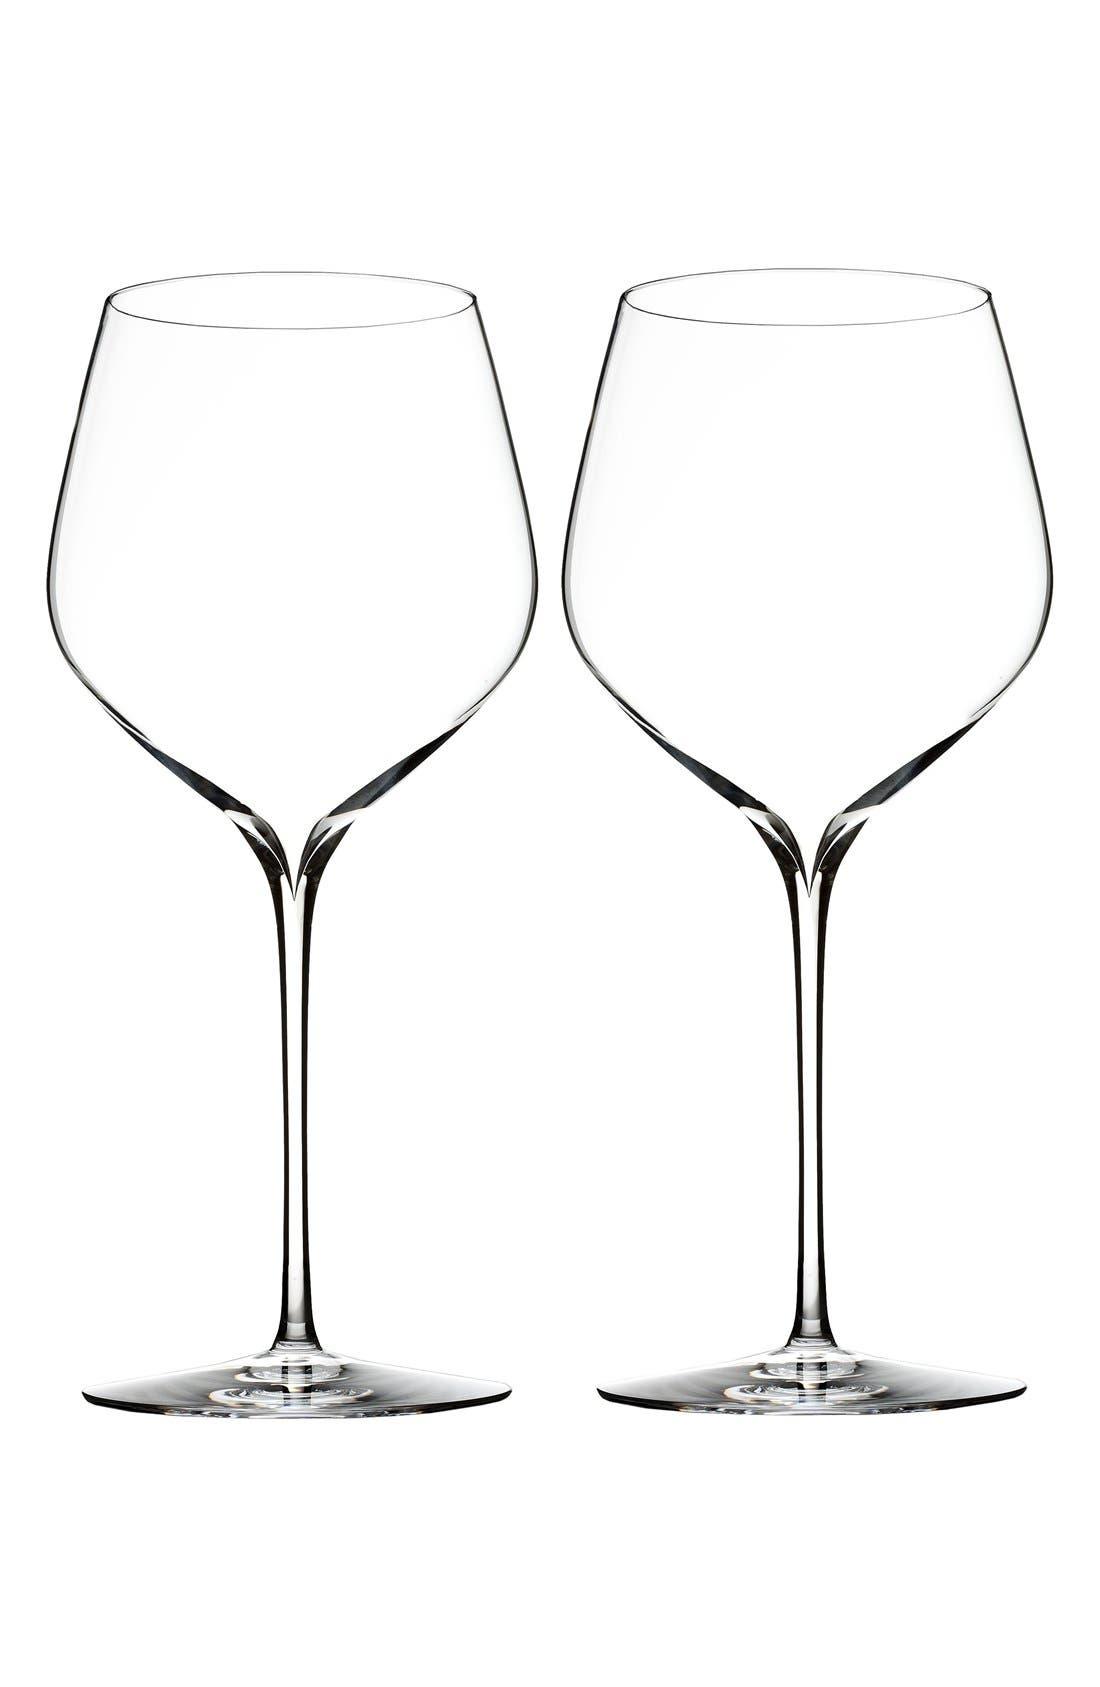 Waterford 'Elegance' Fine Crystal Cabernet Sauvignon Glasses (Set of 2)